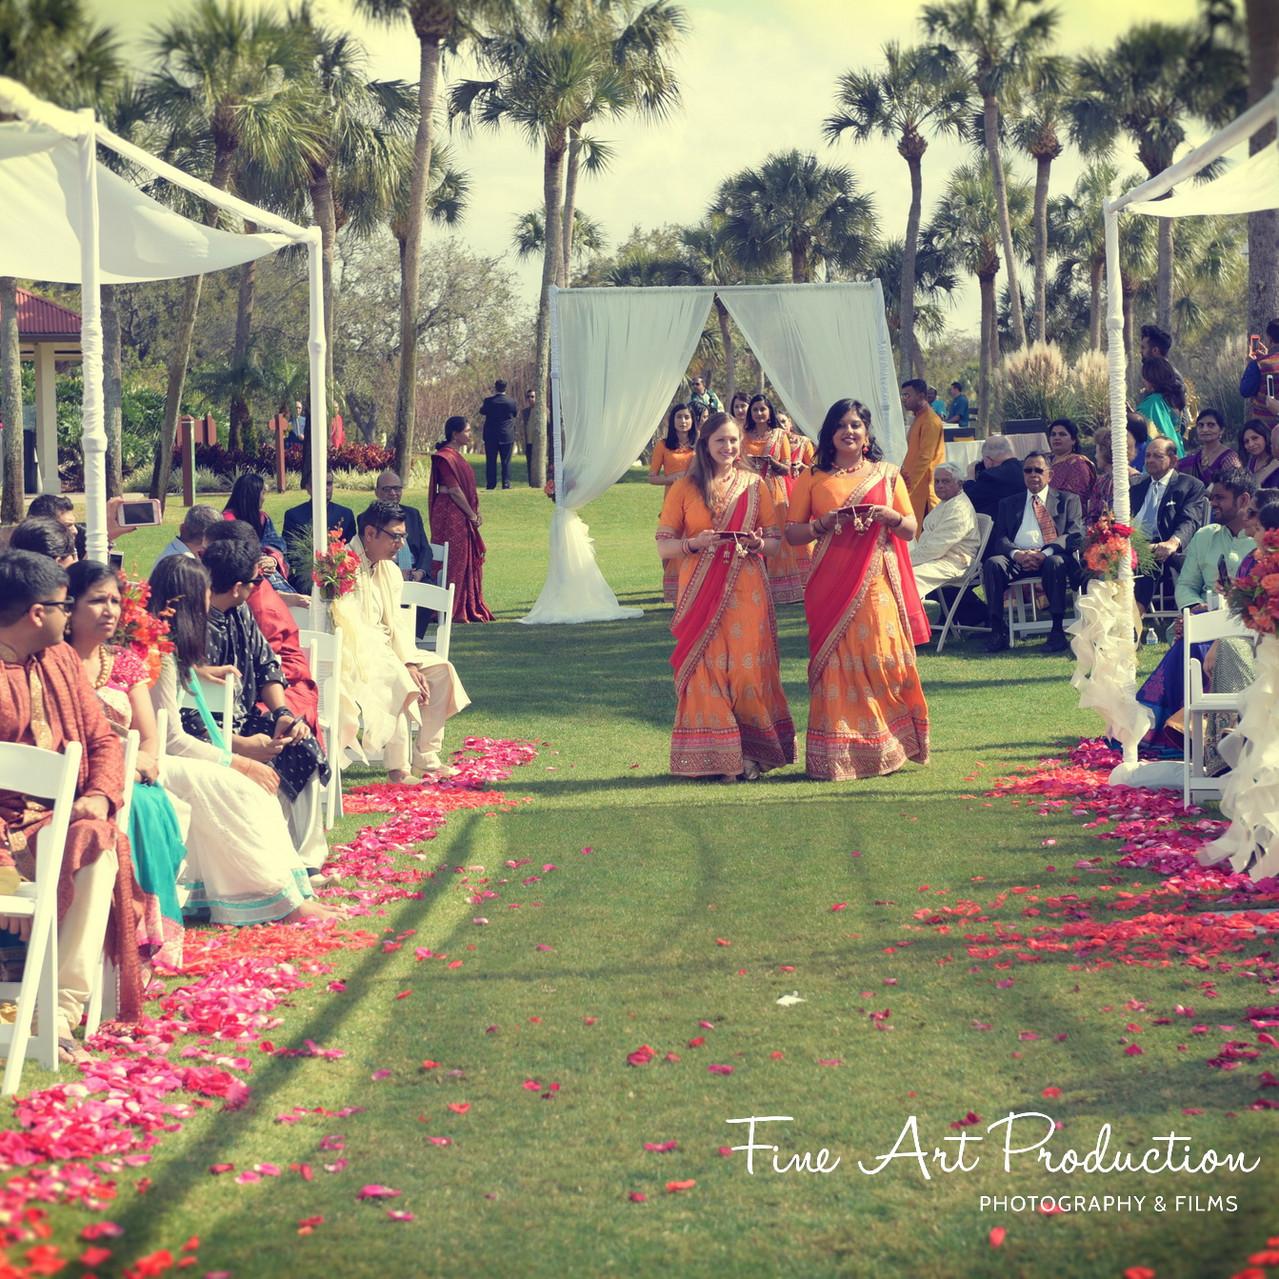 Hyatt-Regency-Grand-Cypress-Indian-Wedding-Photography-Fine-Art-Production-Amish-Thakkar_50